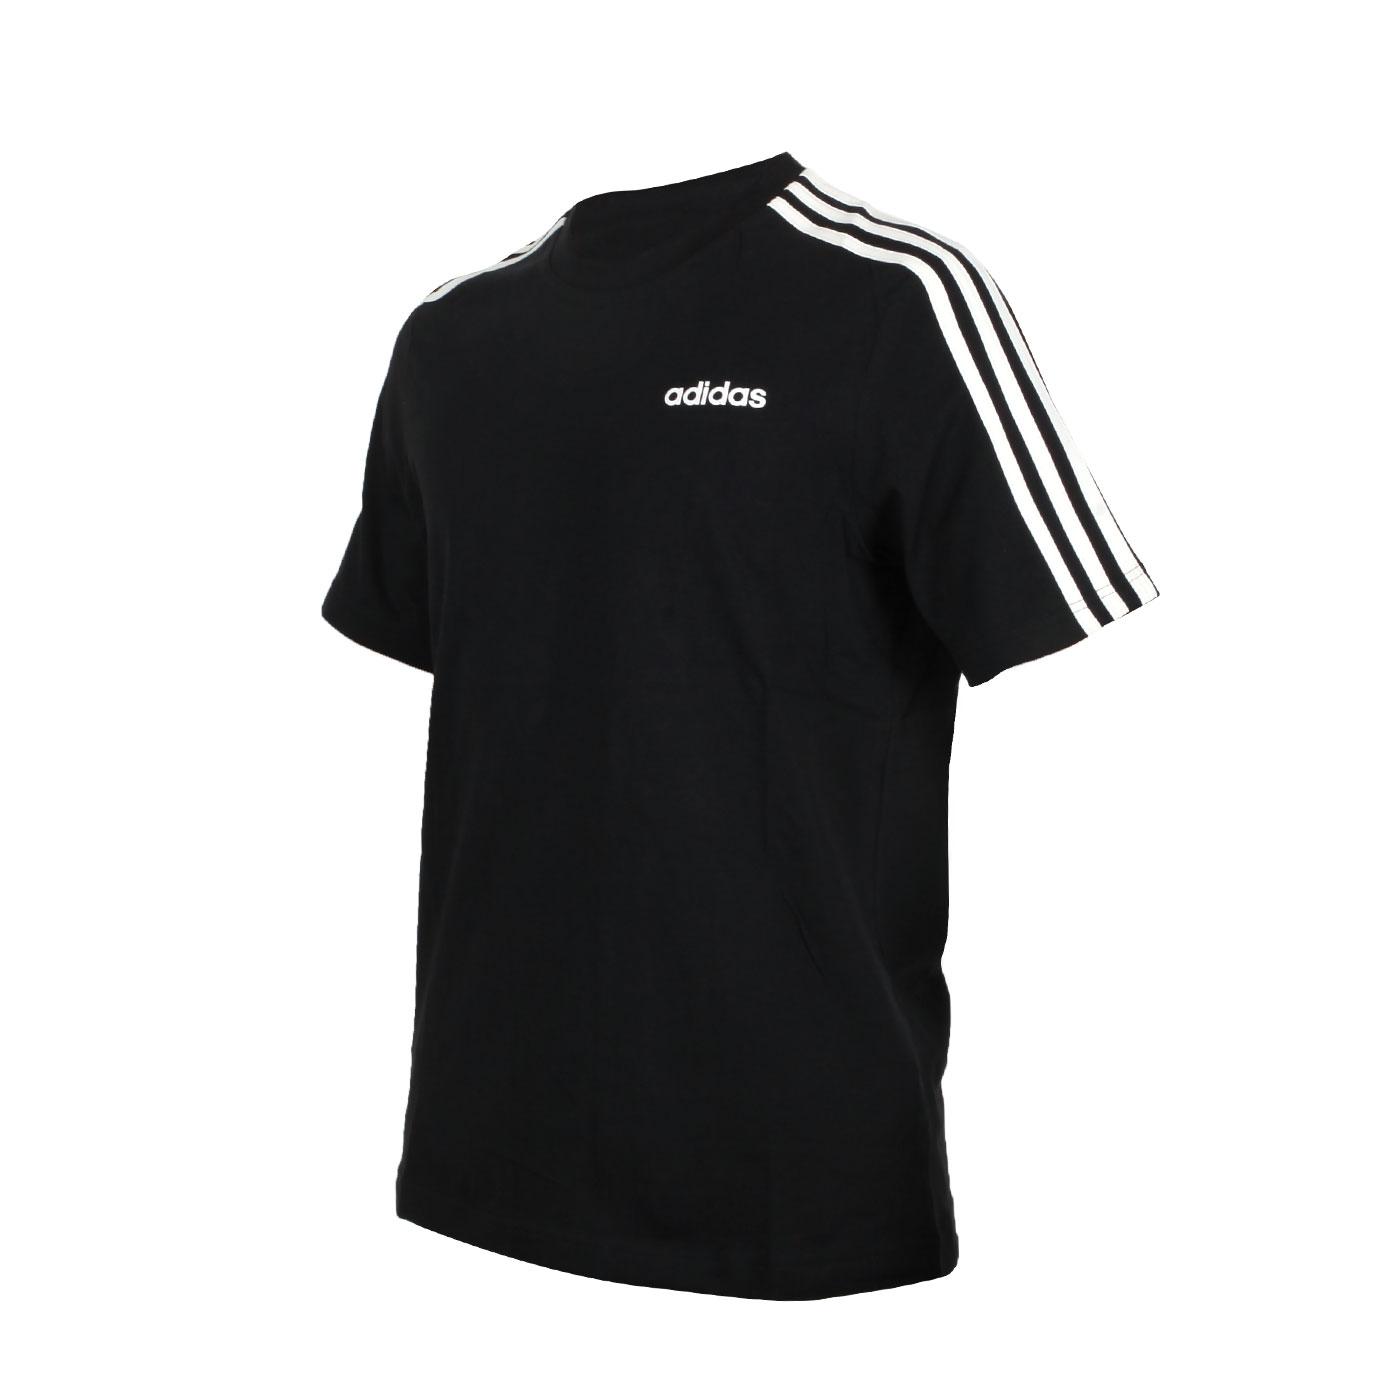 ADIDAS 男款短袖T恤 DQ3113 - 黑白